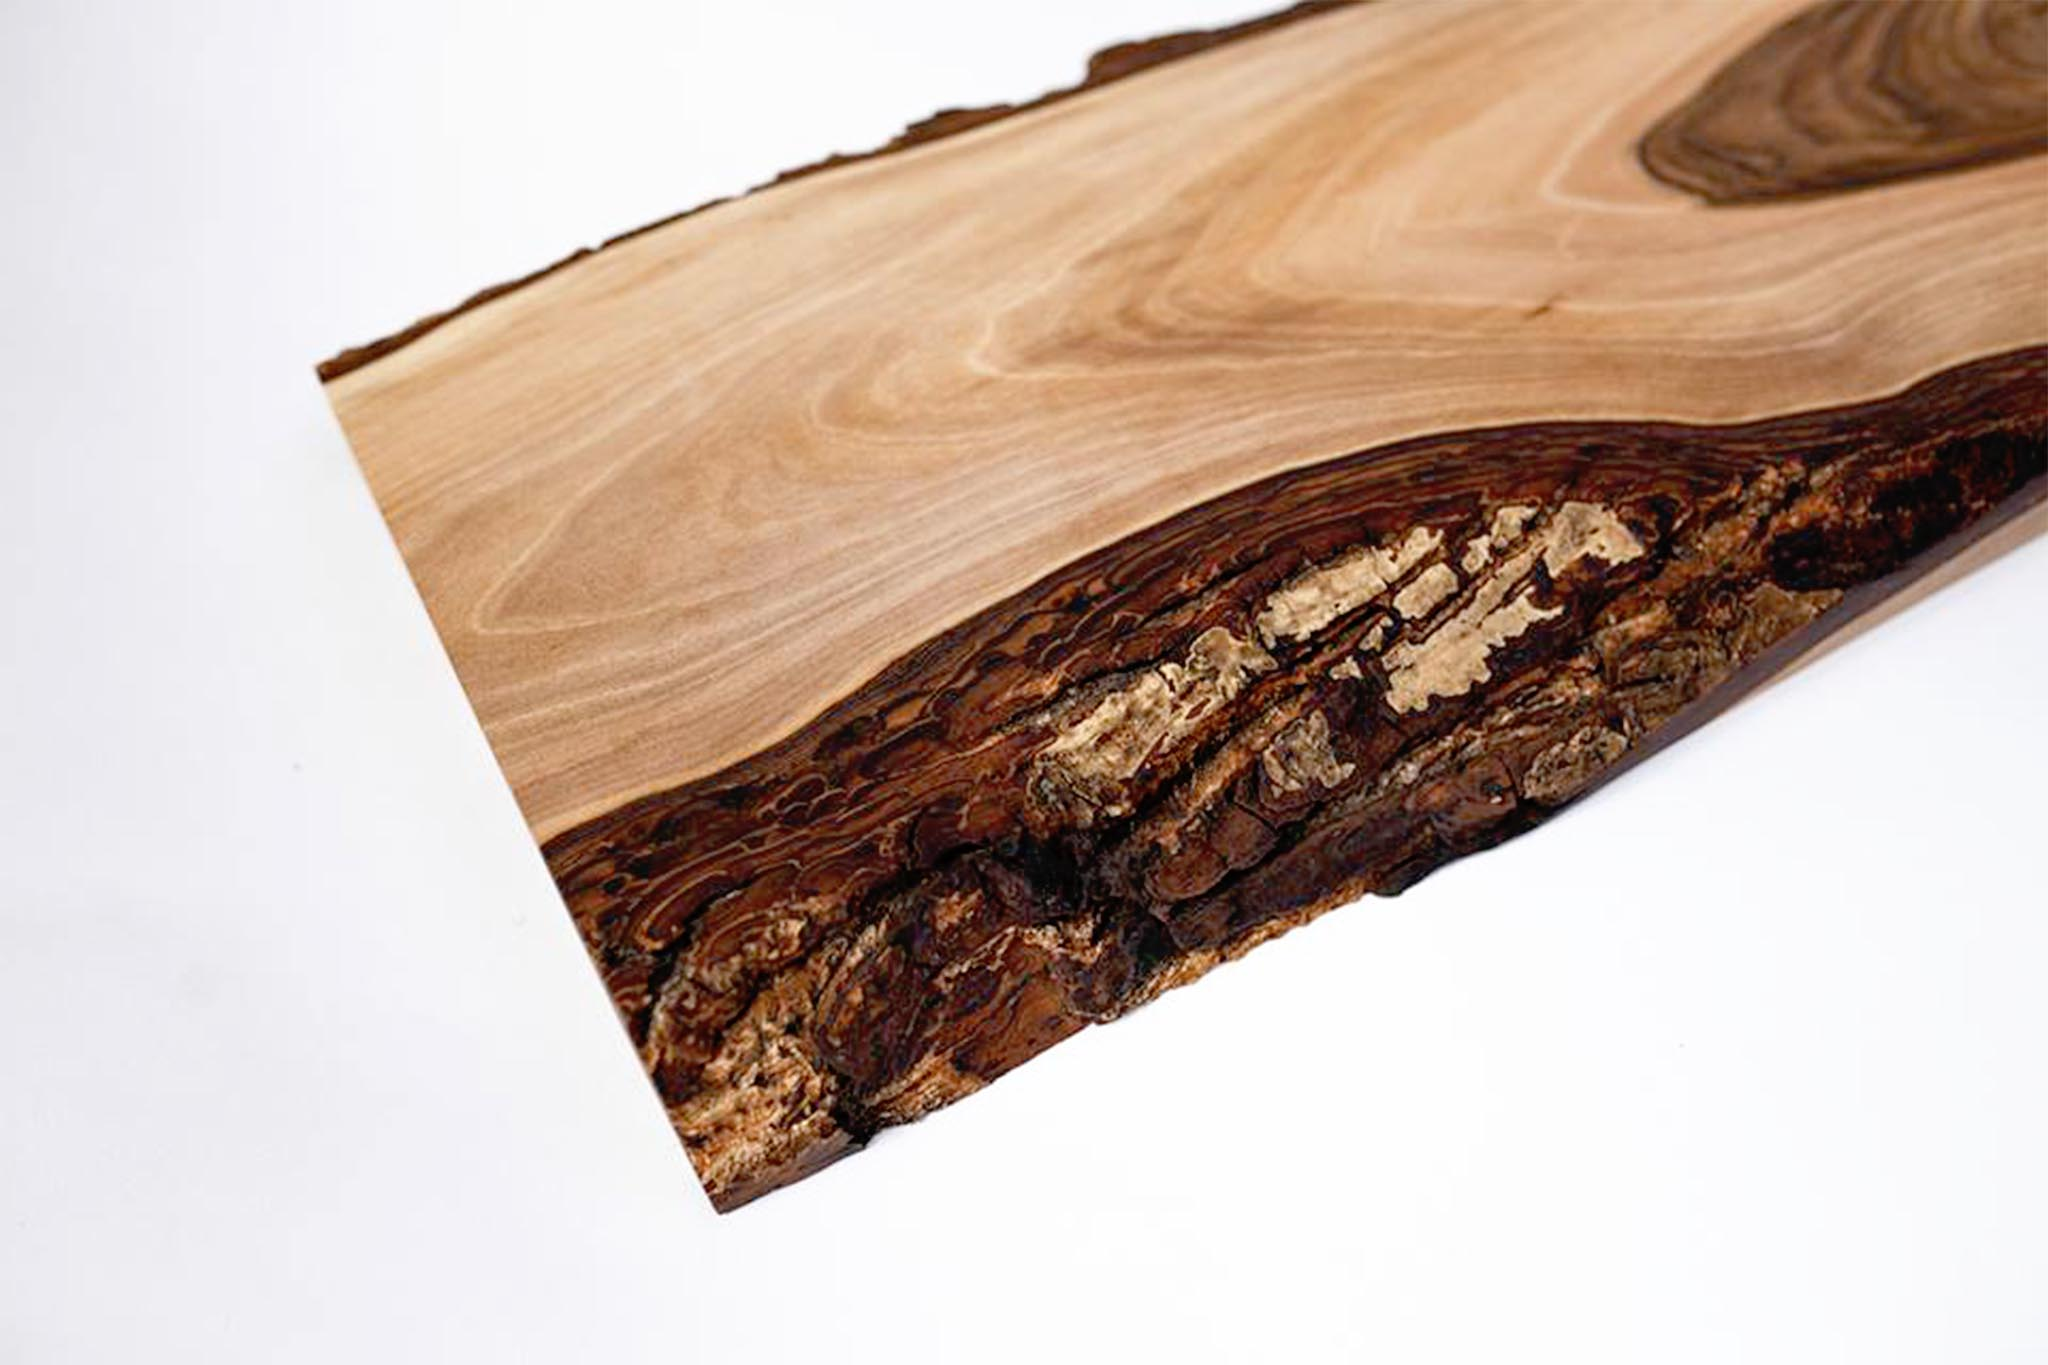 Walnut Wood Cutting Board With Bark Irregular Shape Genuine Strap